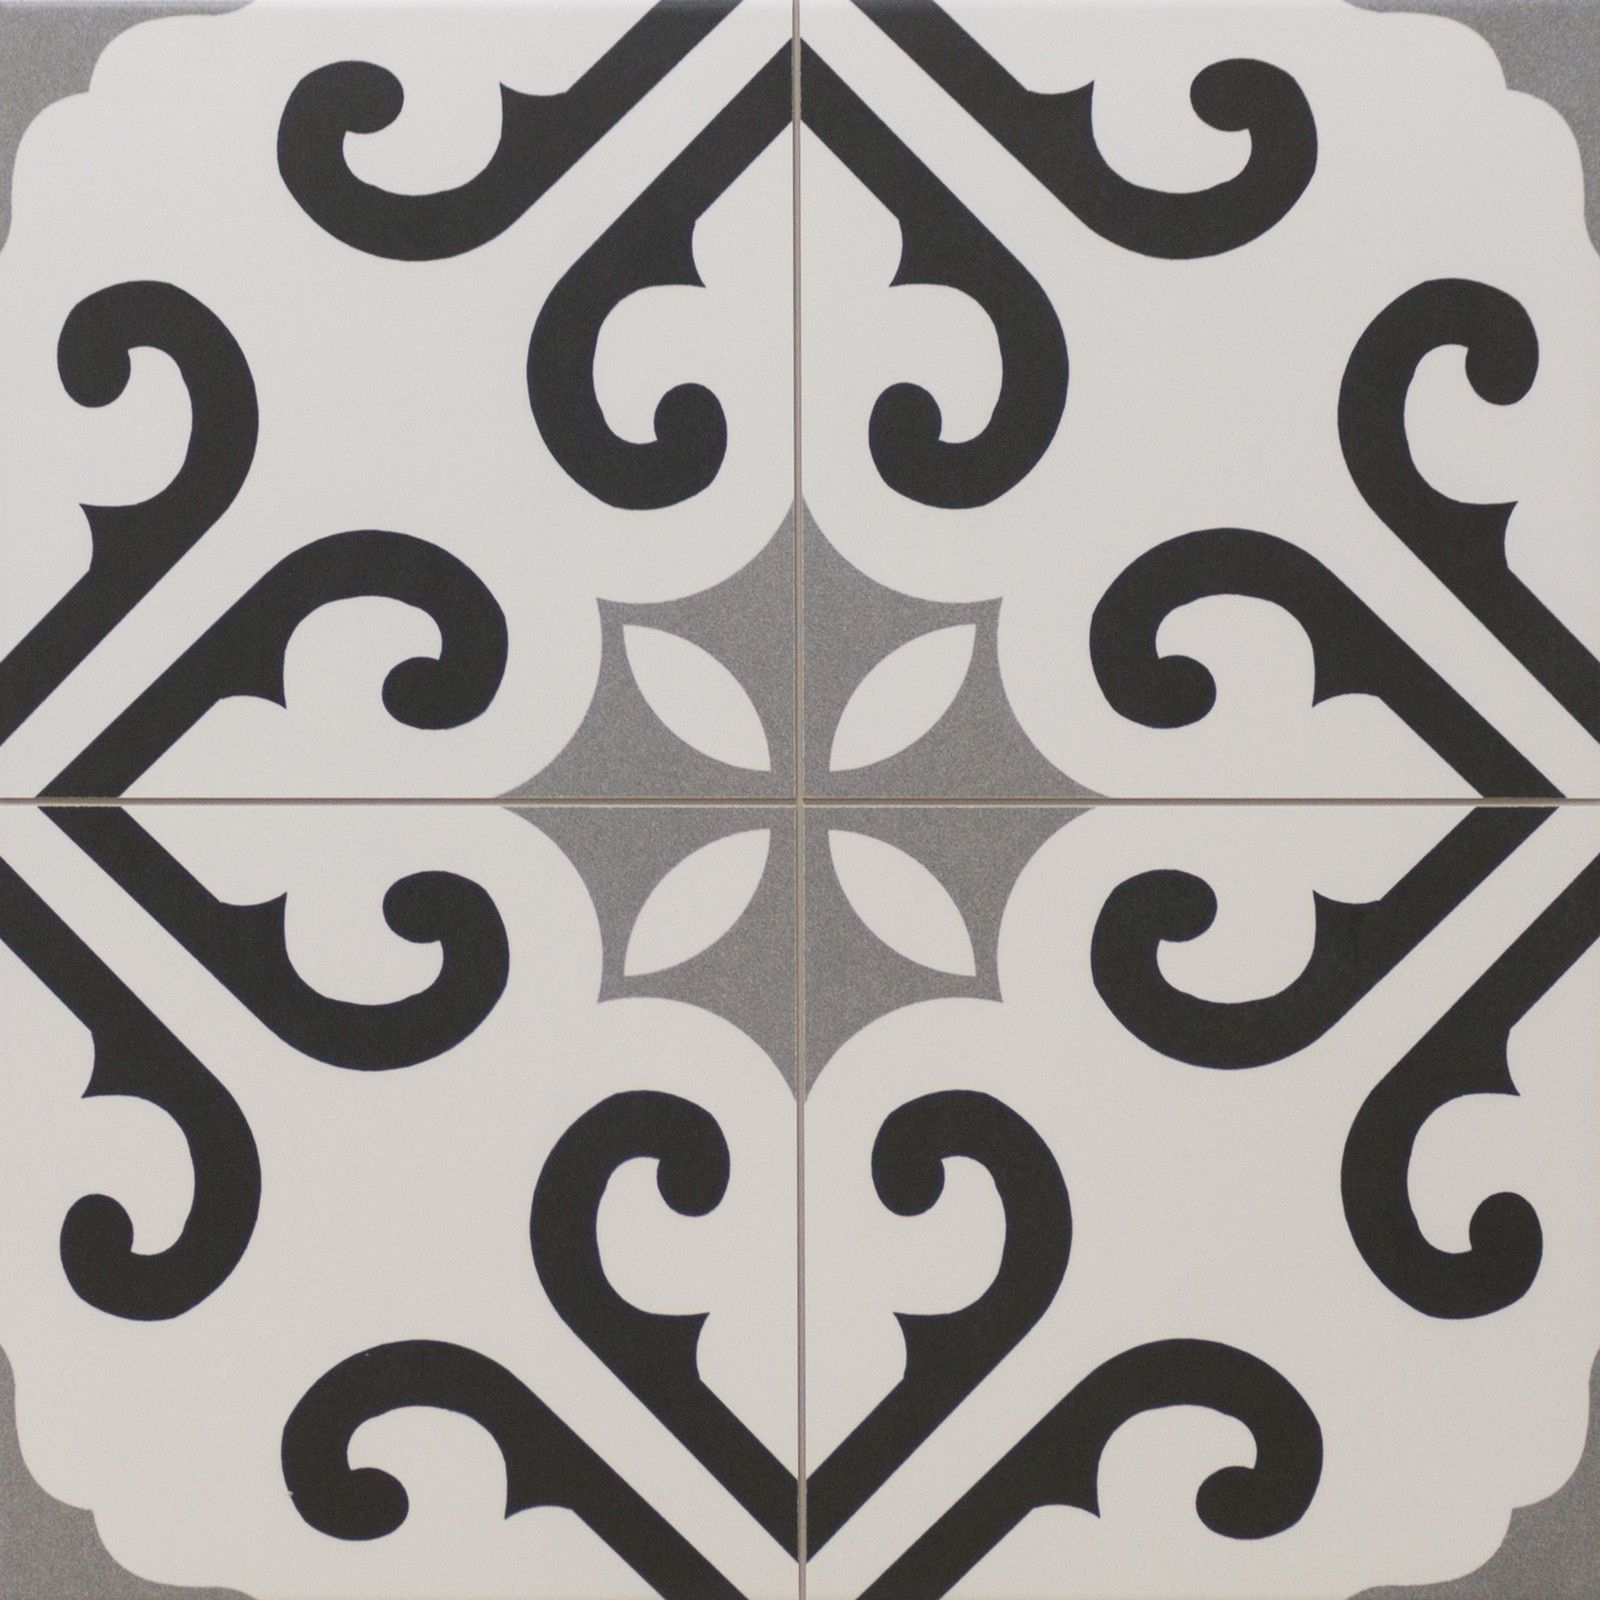 Derby Pattern Porcelain Floor Tiles Tile Floor Wall Floor